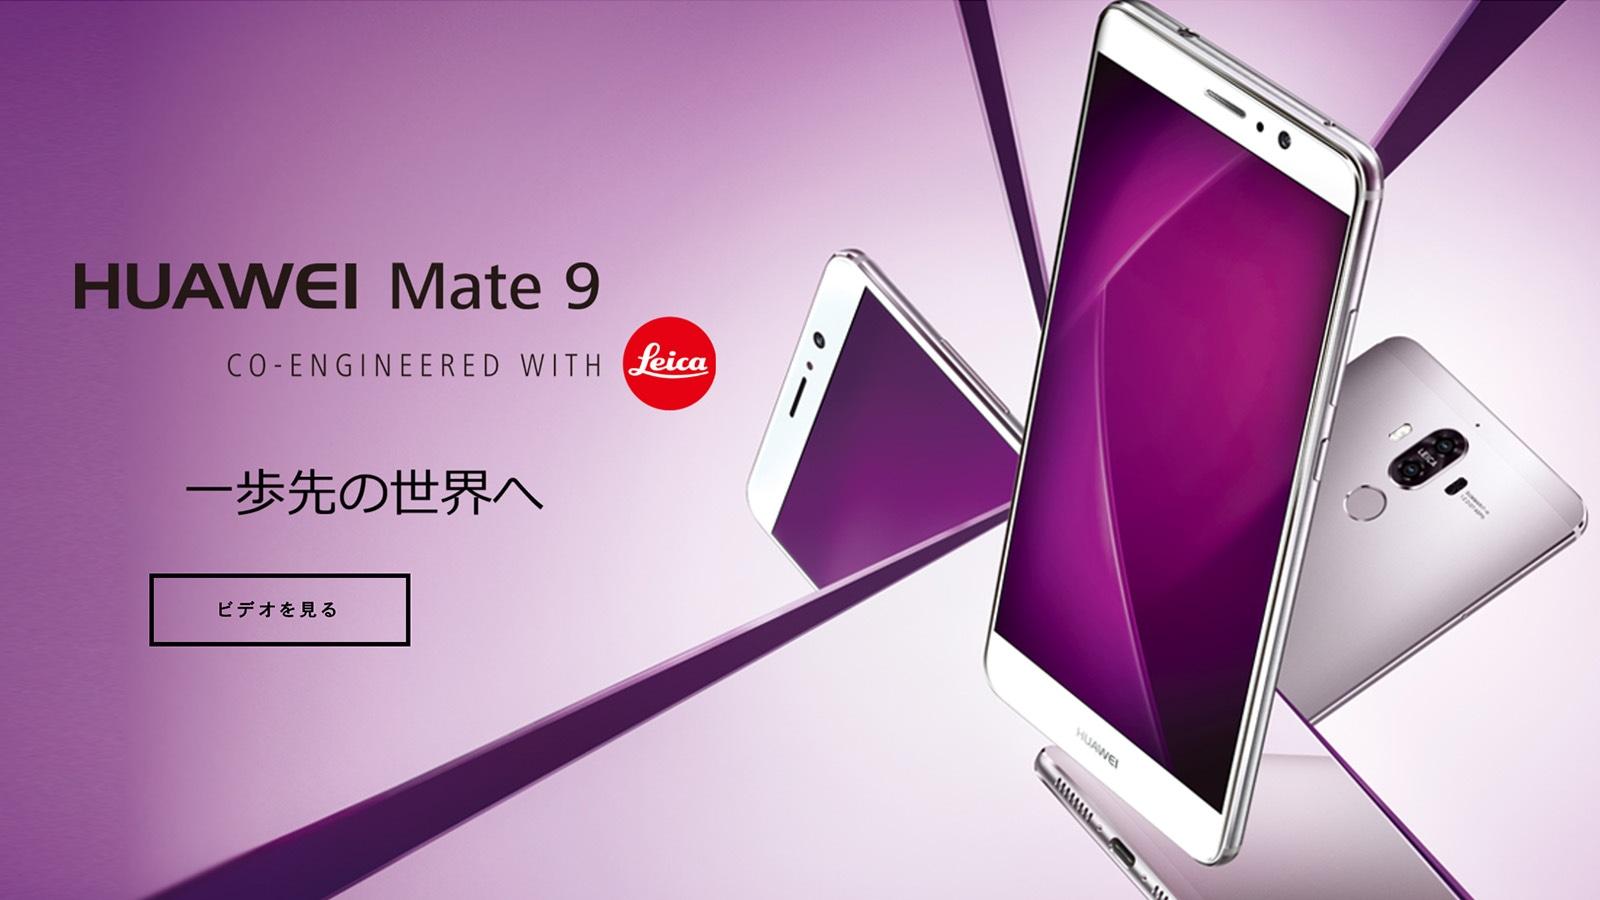 Huawei Mate 9 Webサイト